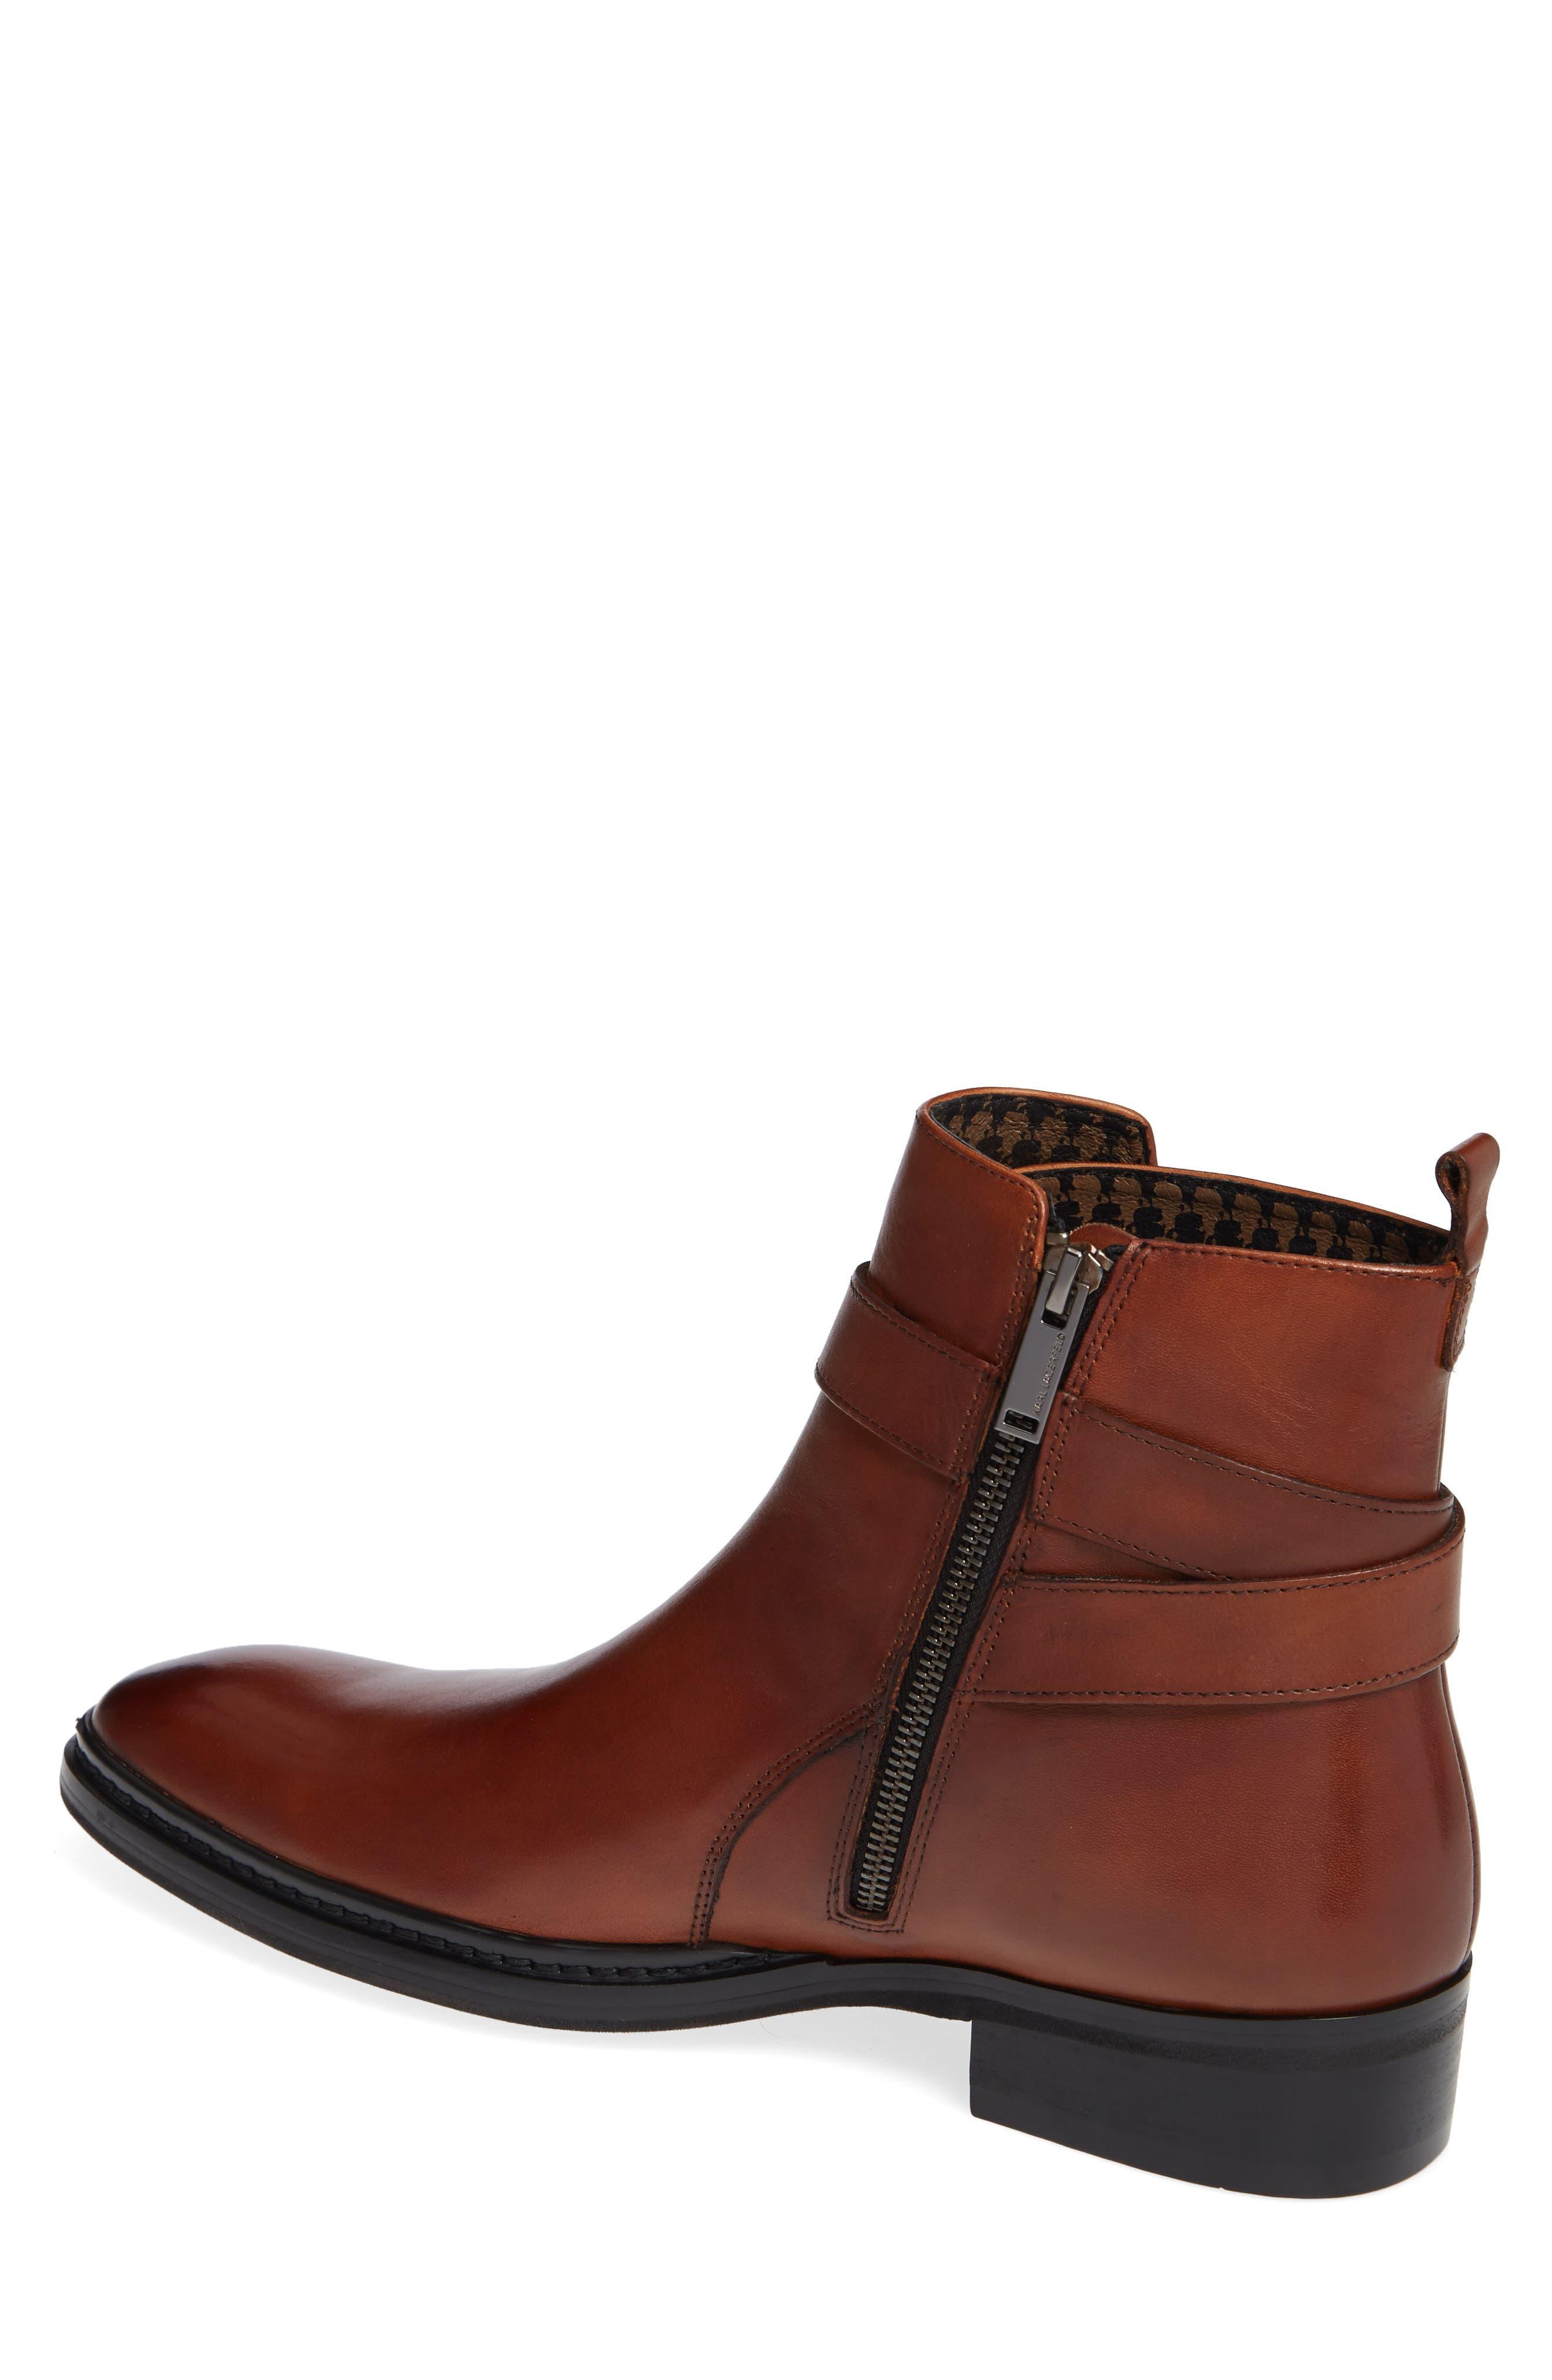 Ankle Wrap Boot,                             Alternate thumbnail 2, color,                             239